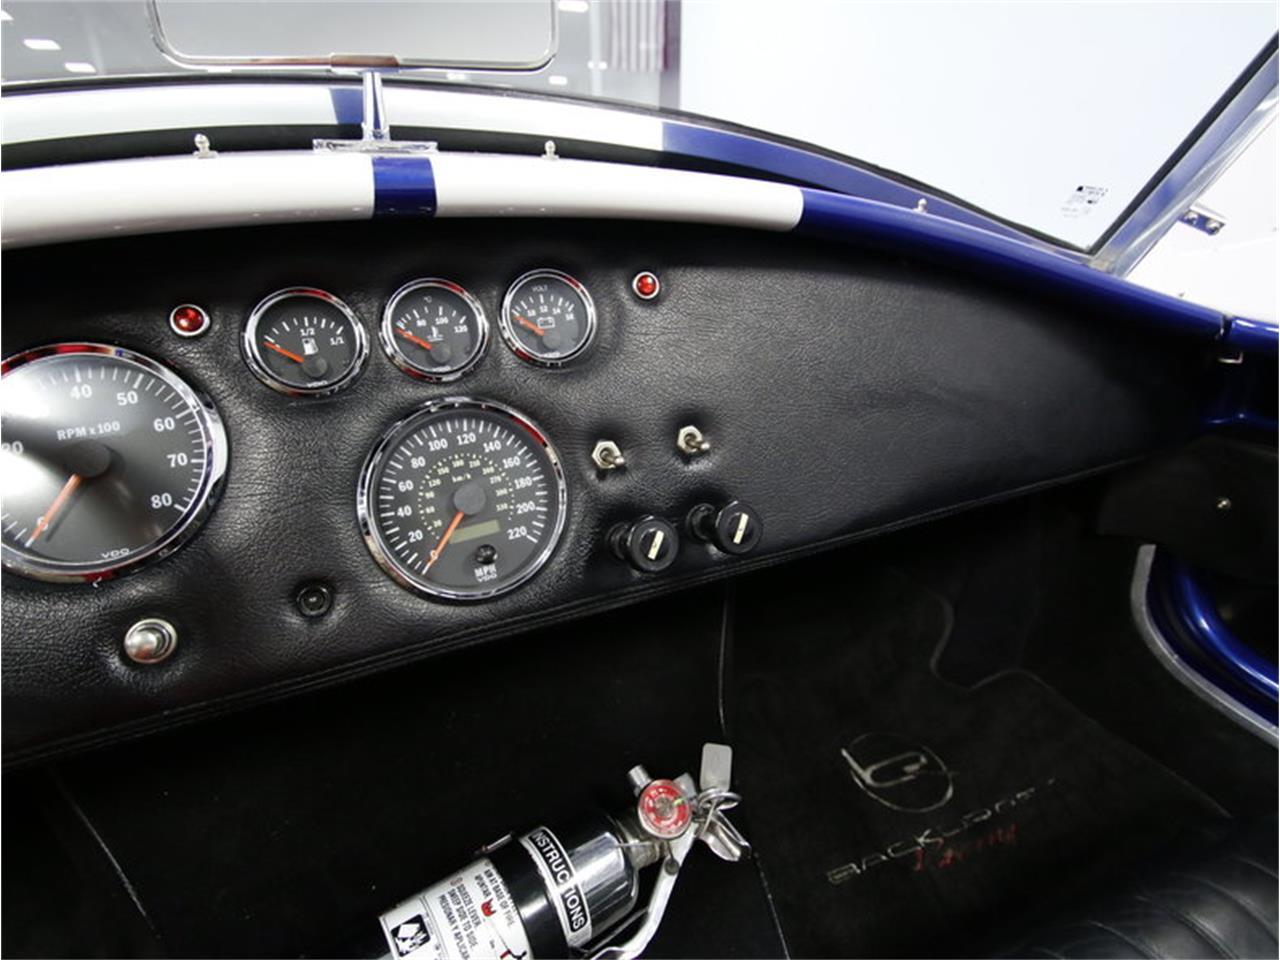 Large Picture of Classic 1965 Cobra located in North Carolina - $59,995.00 - LB11